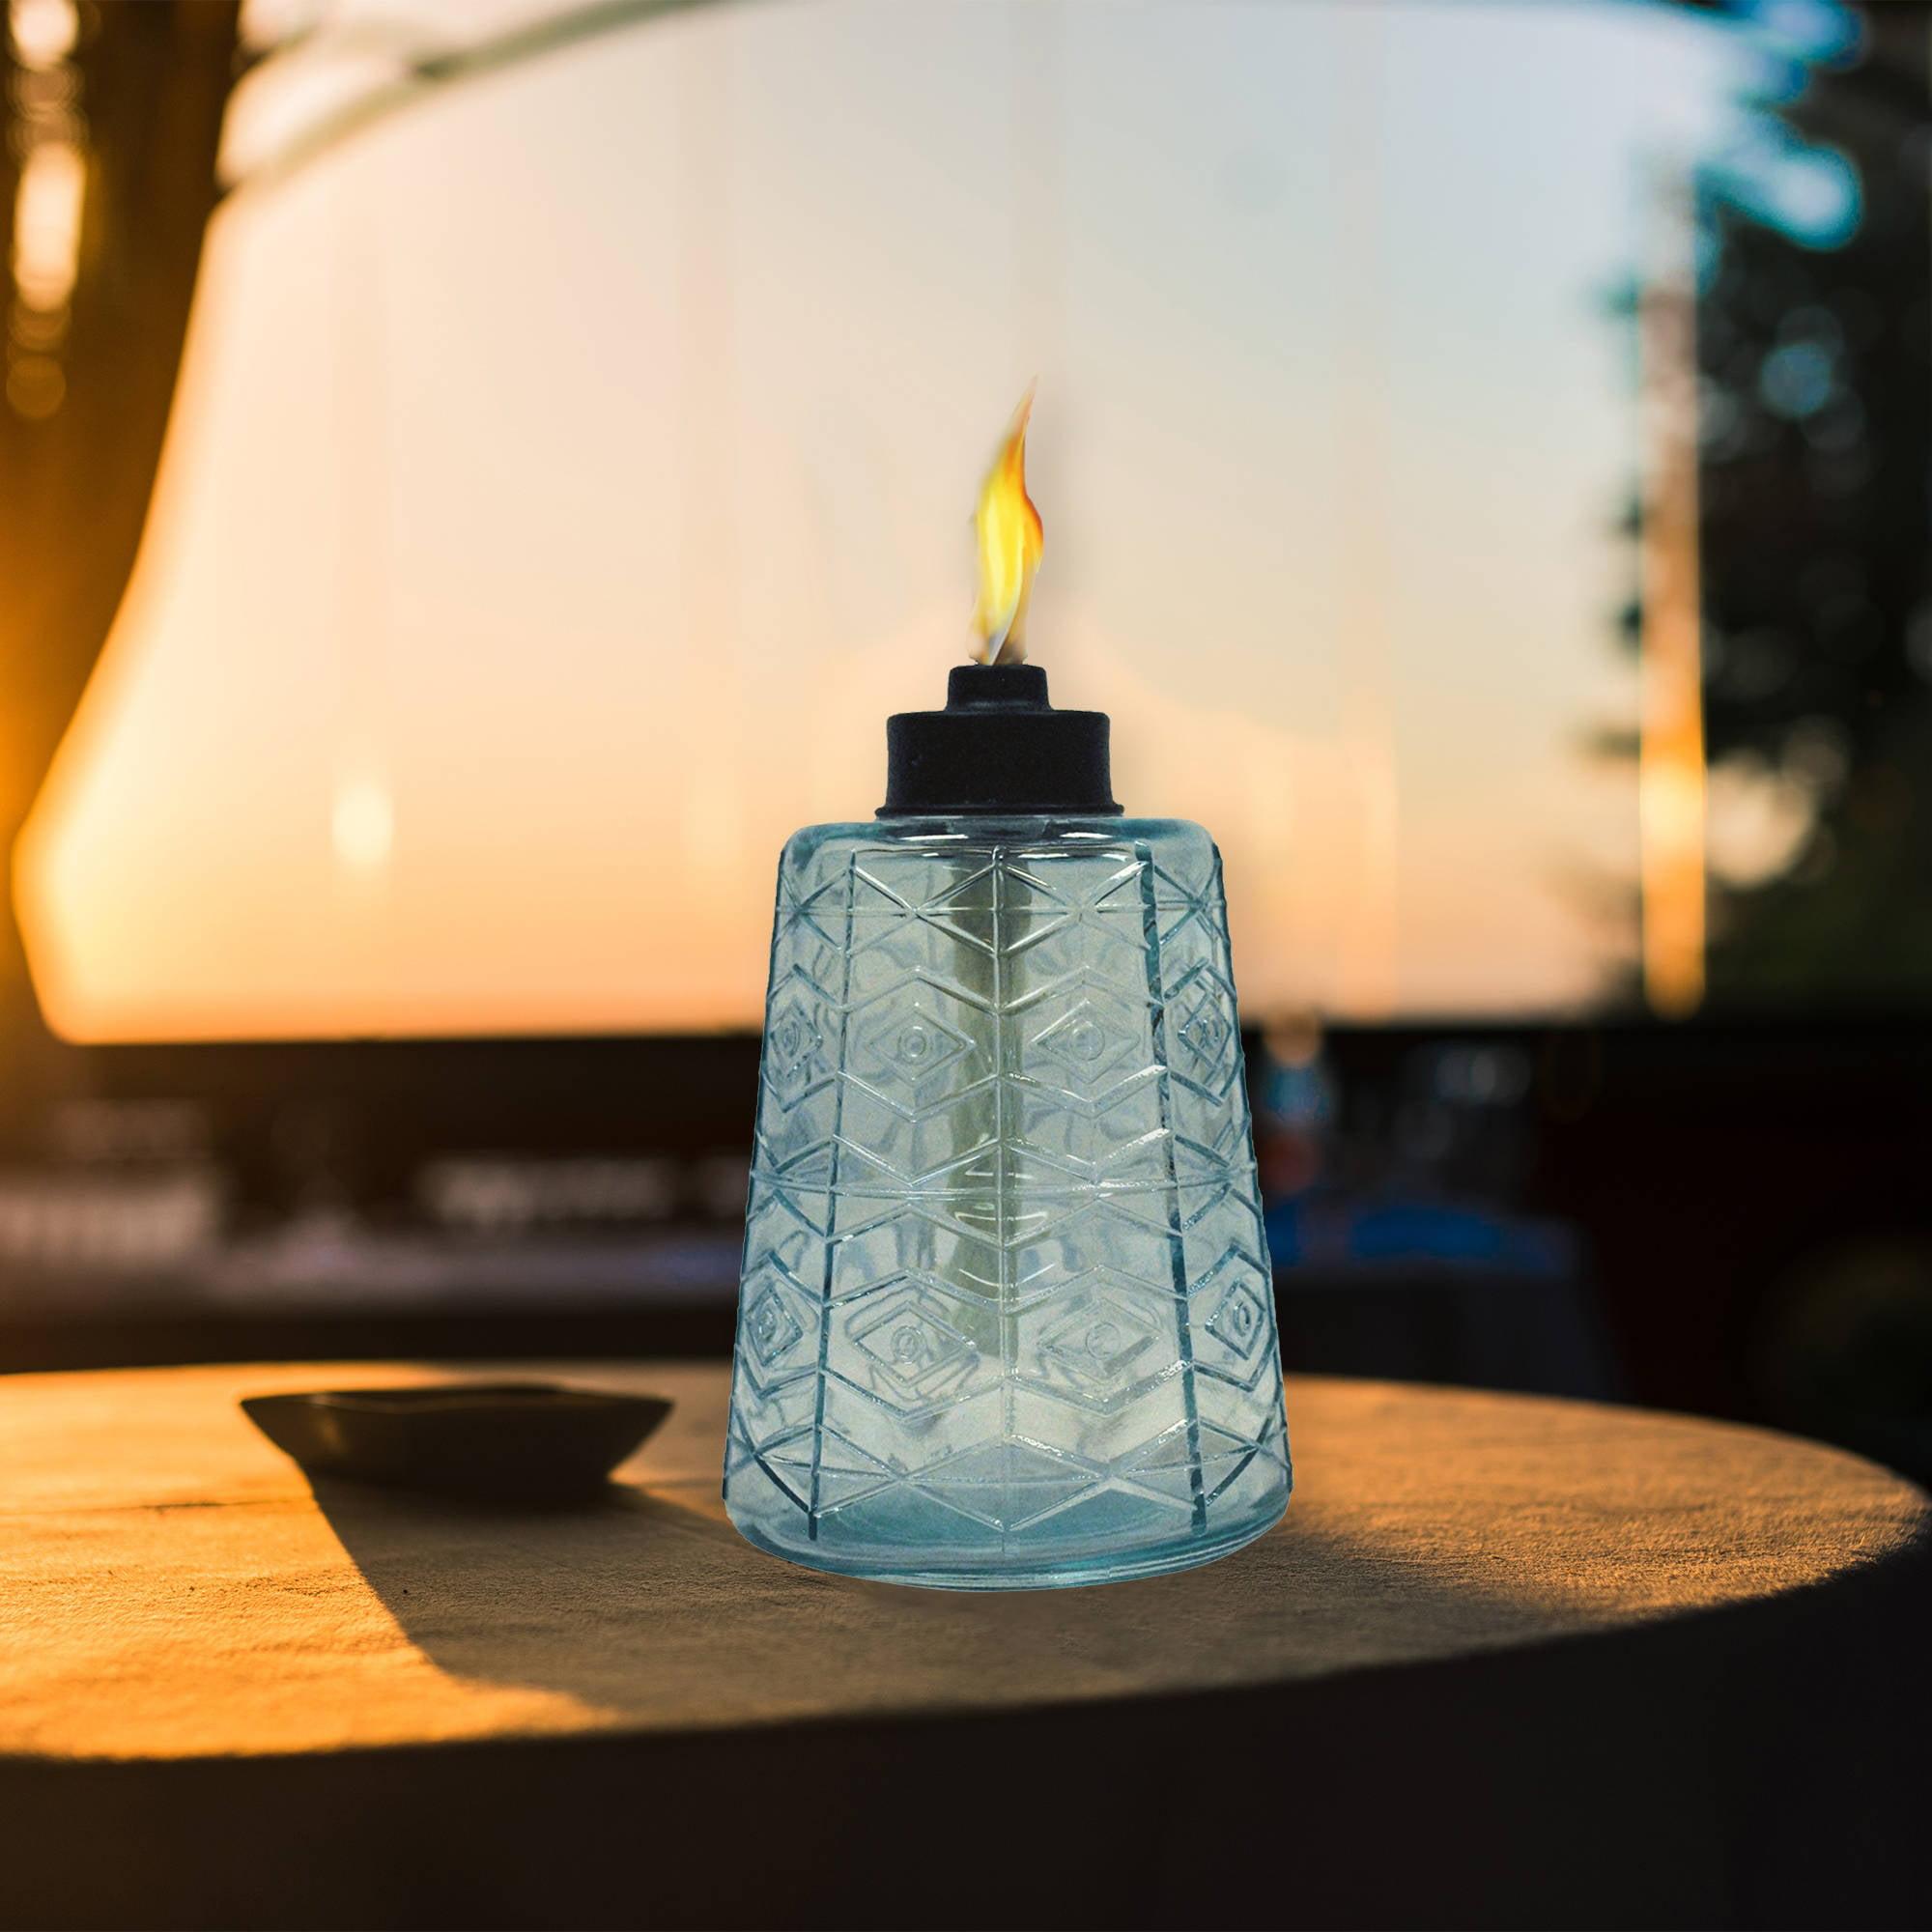 Superieur Tikiâ® Glass Tabletop Torch   Walmart.com